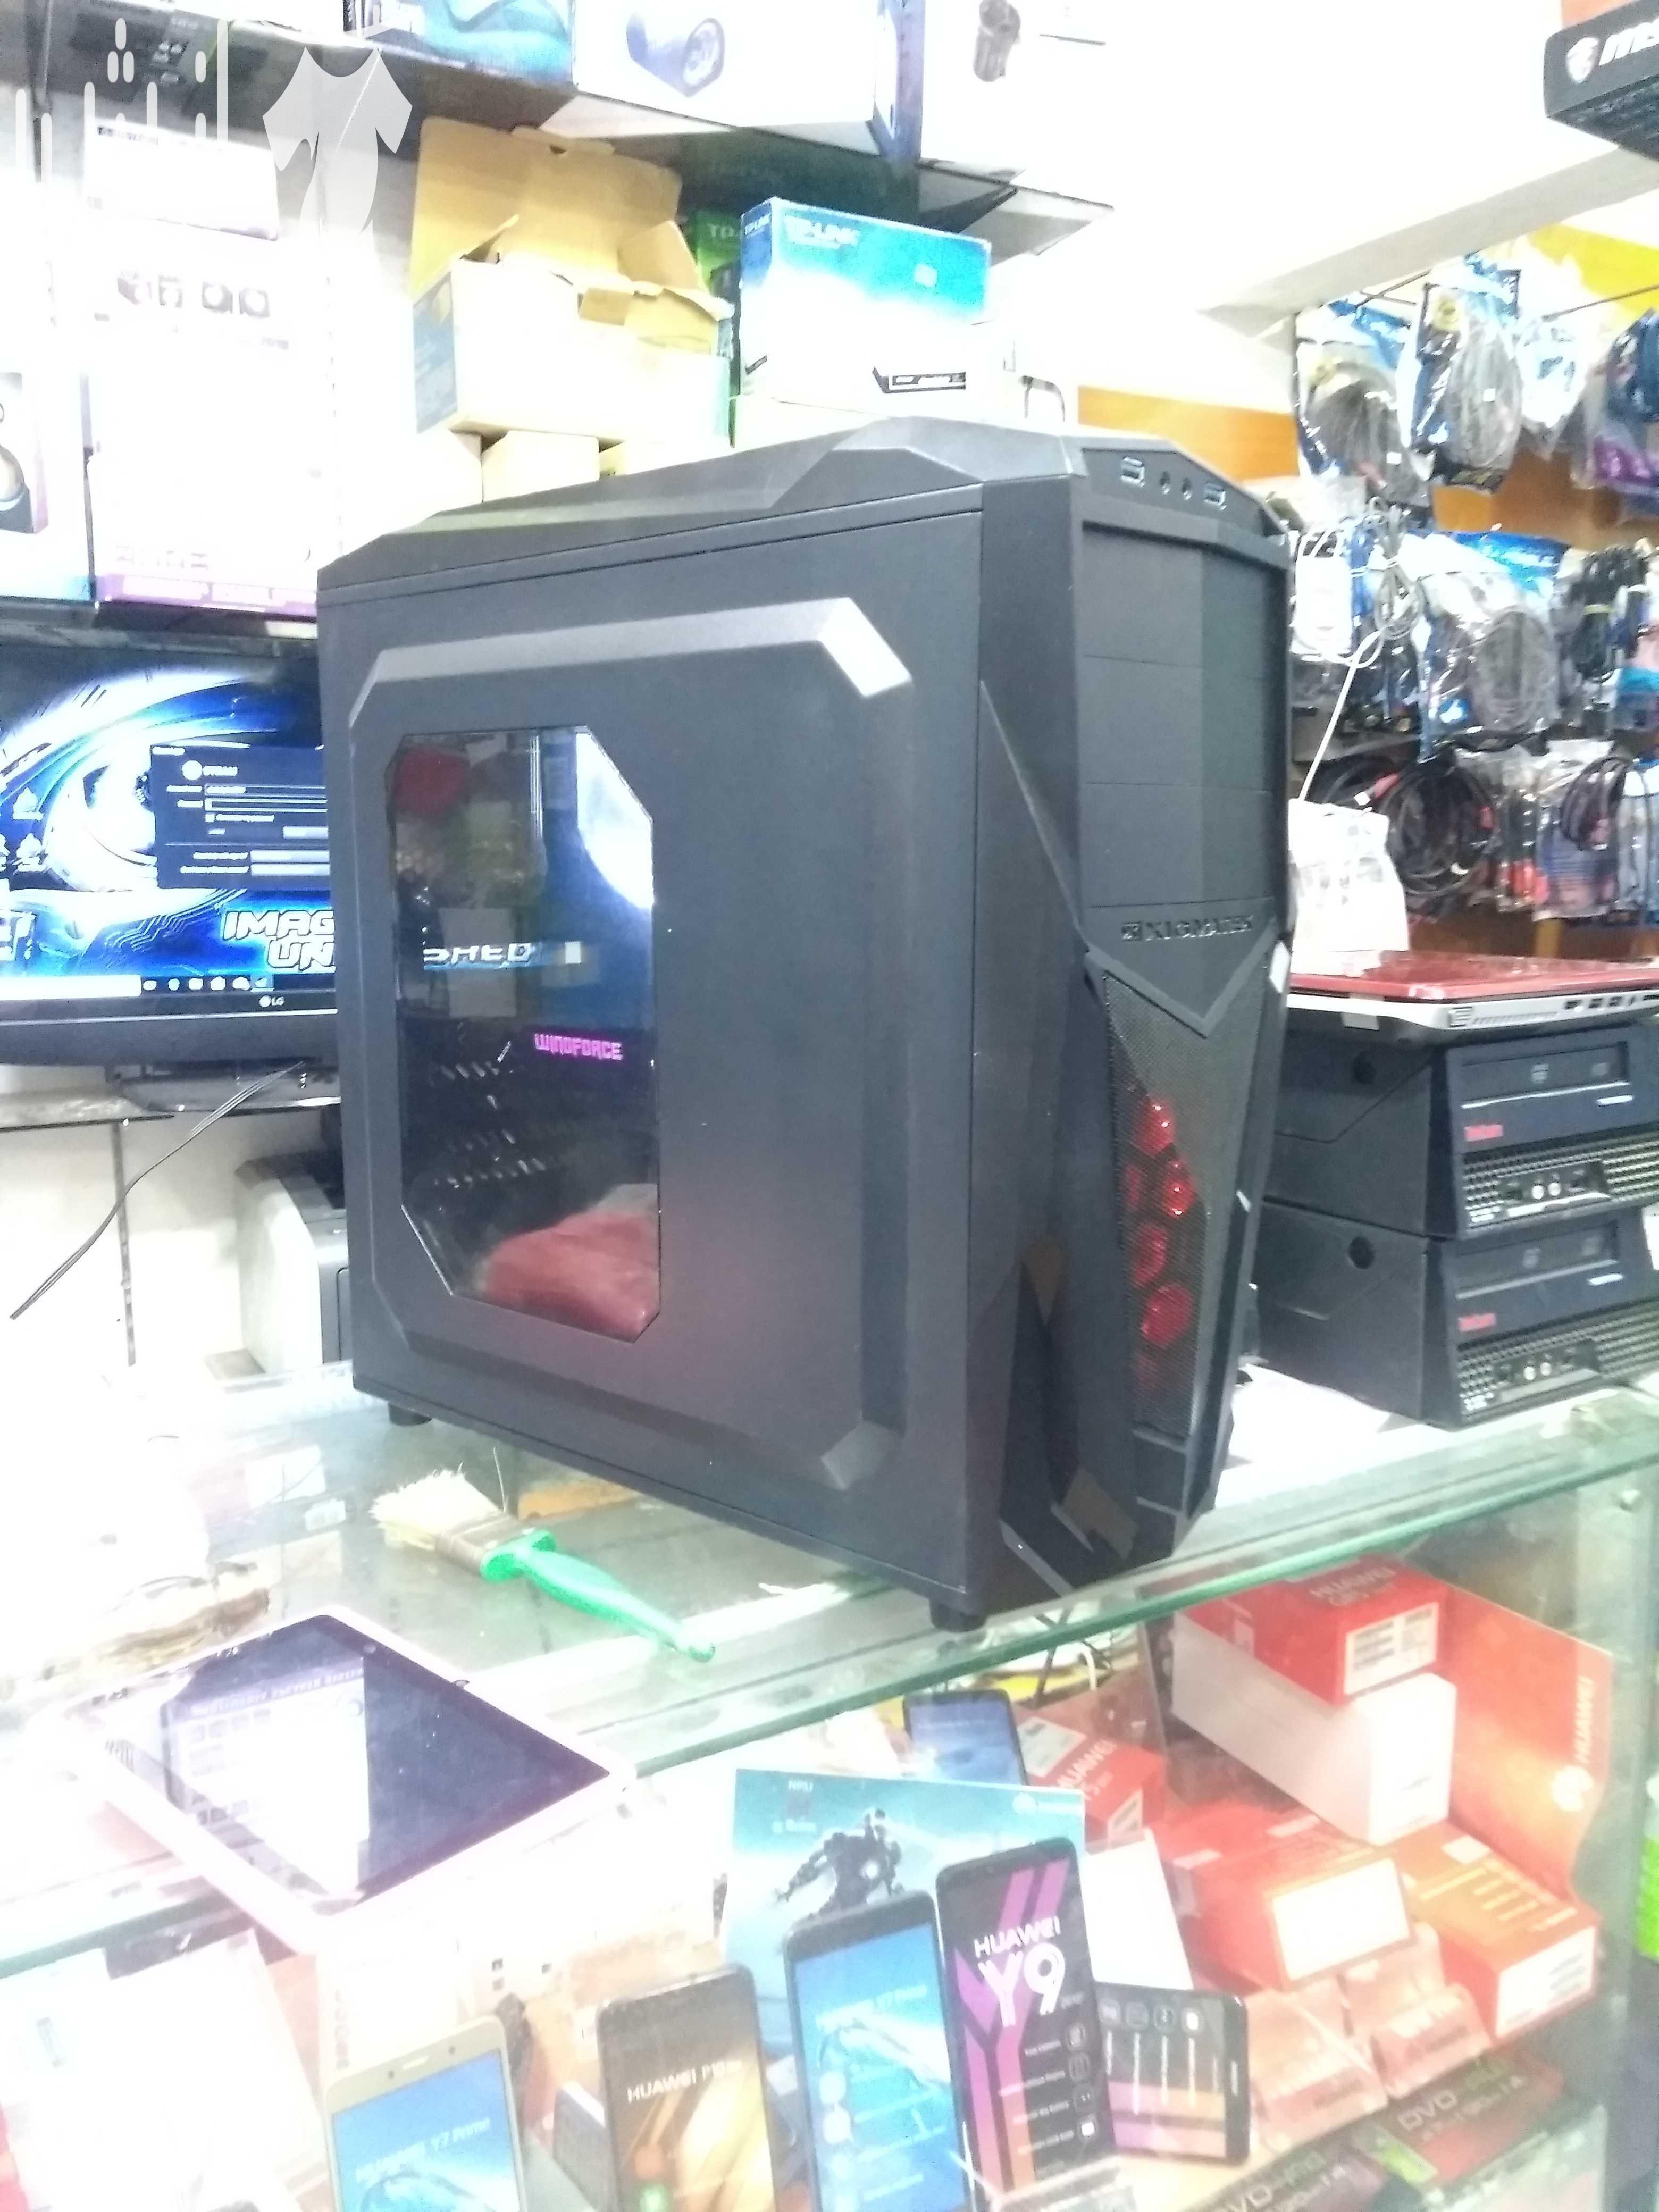 HP Super Gaming i7 9th Gen 12GB Graphic 16GB Ram Laptop-  كمبيوتر احترافي كامل...